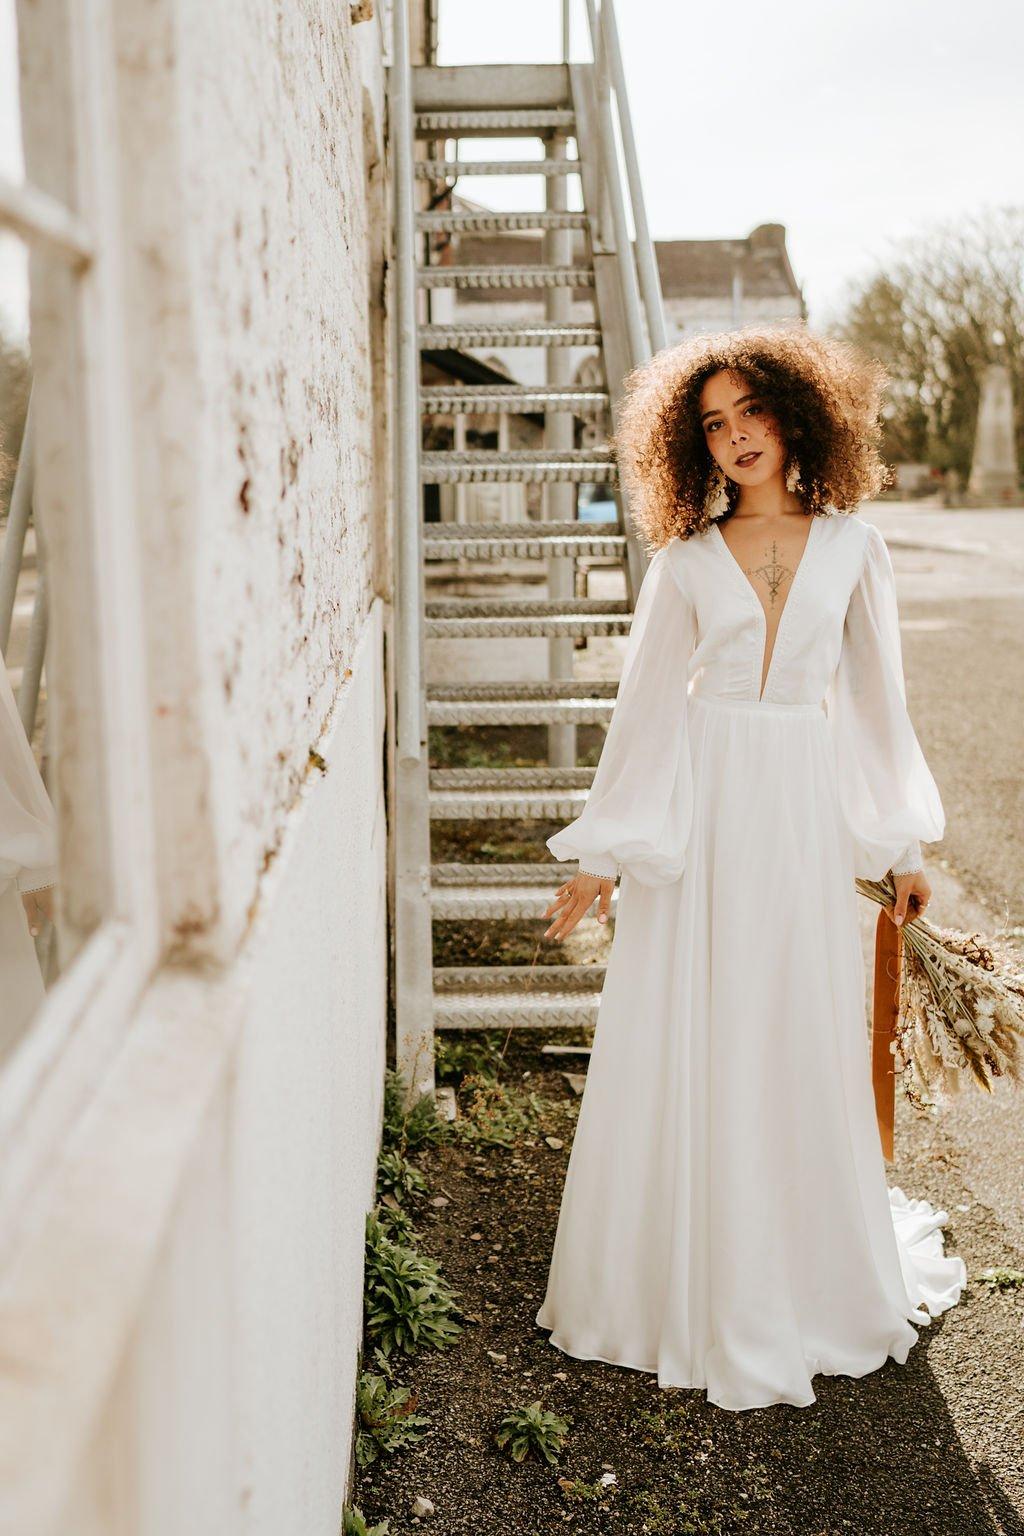 Kiki by Shikoba Bride, Ivory boho long sleeved, silk chiffon wedding dress